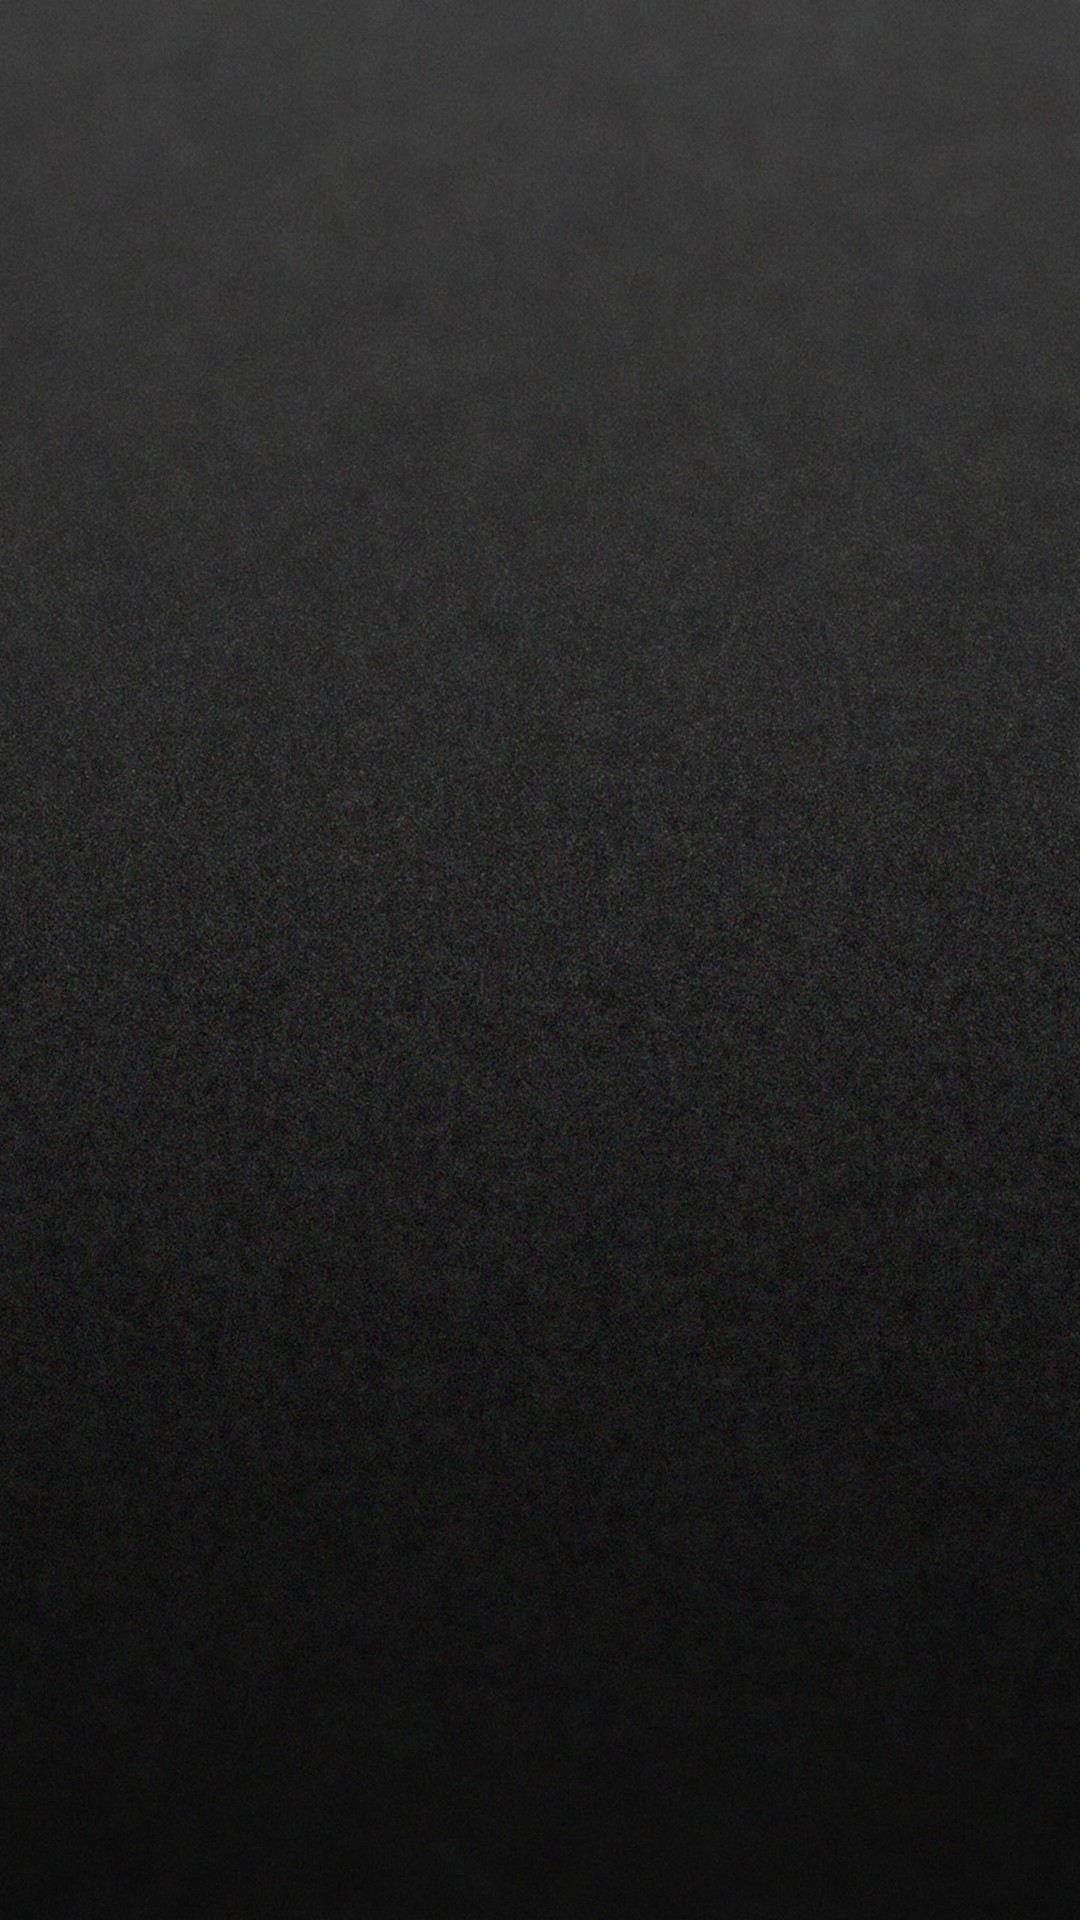 Wallpapers for Galaxy – Carbon Fiber Texture Wallpaper